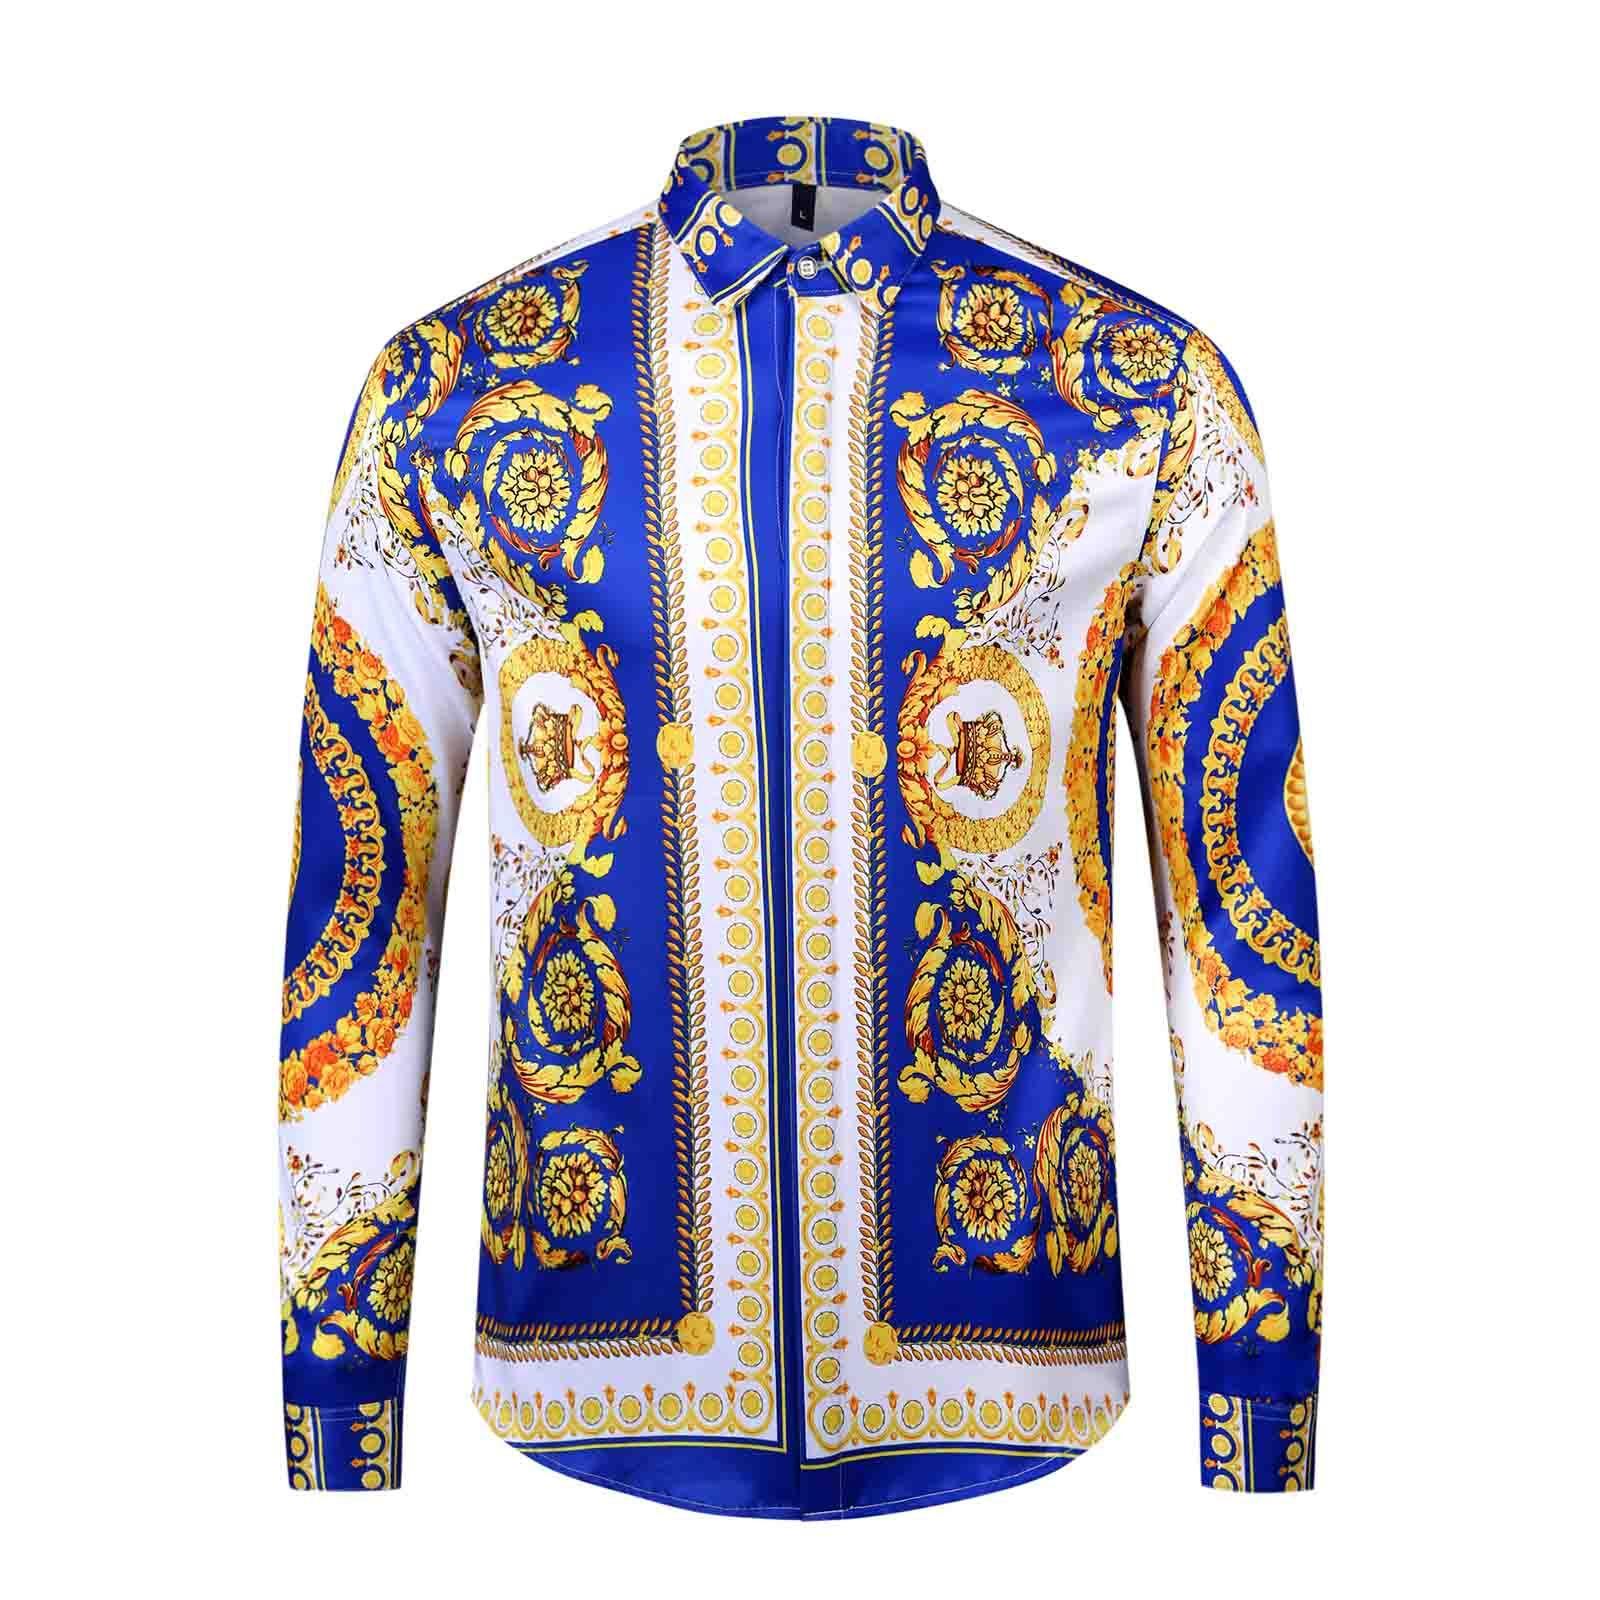 2020 British camisa de la verificación de la marca comercial, marca de diseño de moda de manga larga% 100 ocasional de la camisa de algodón Medusa BB6604 M 3XL